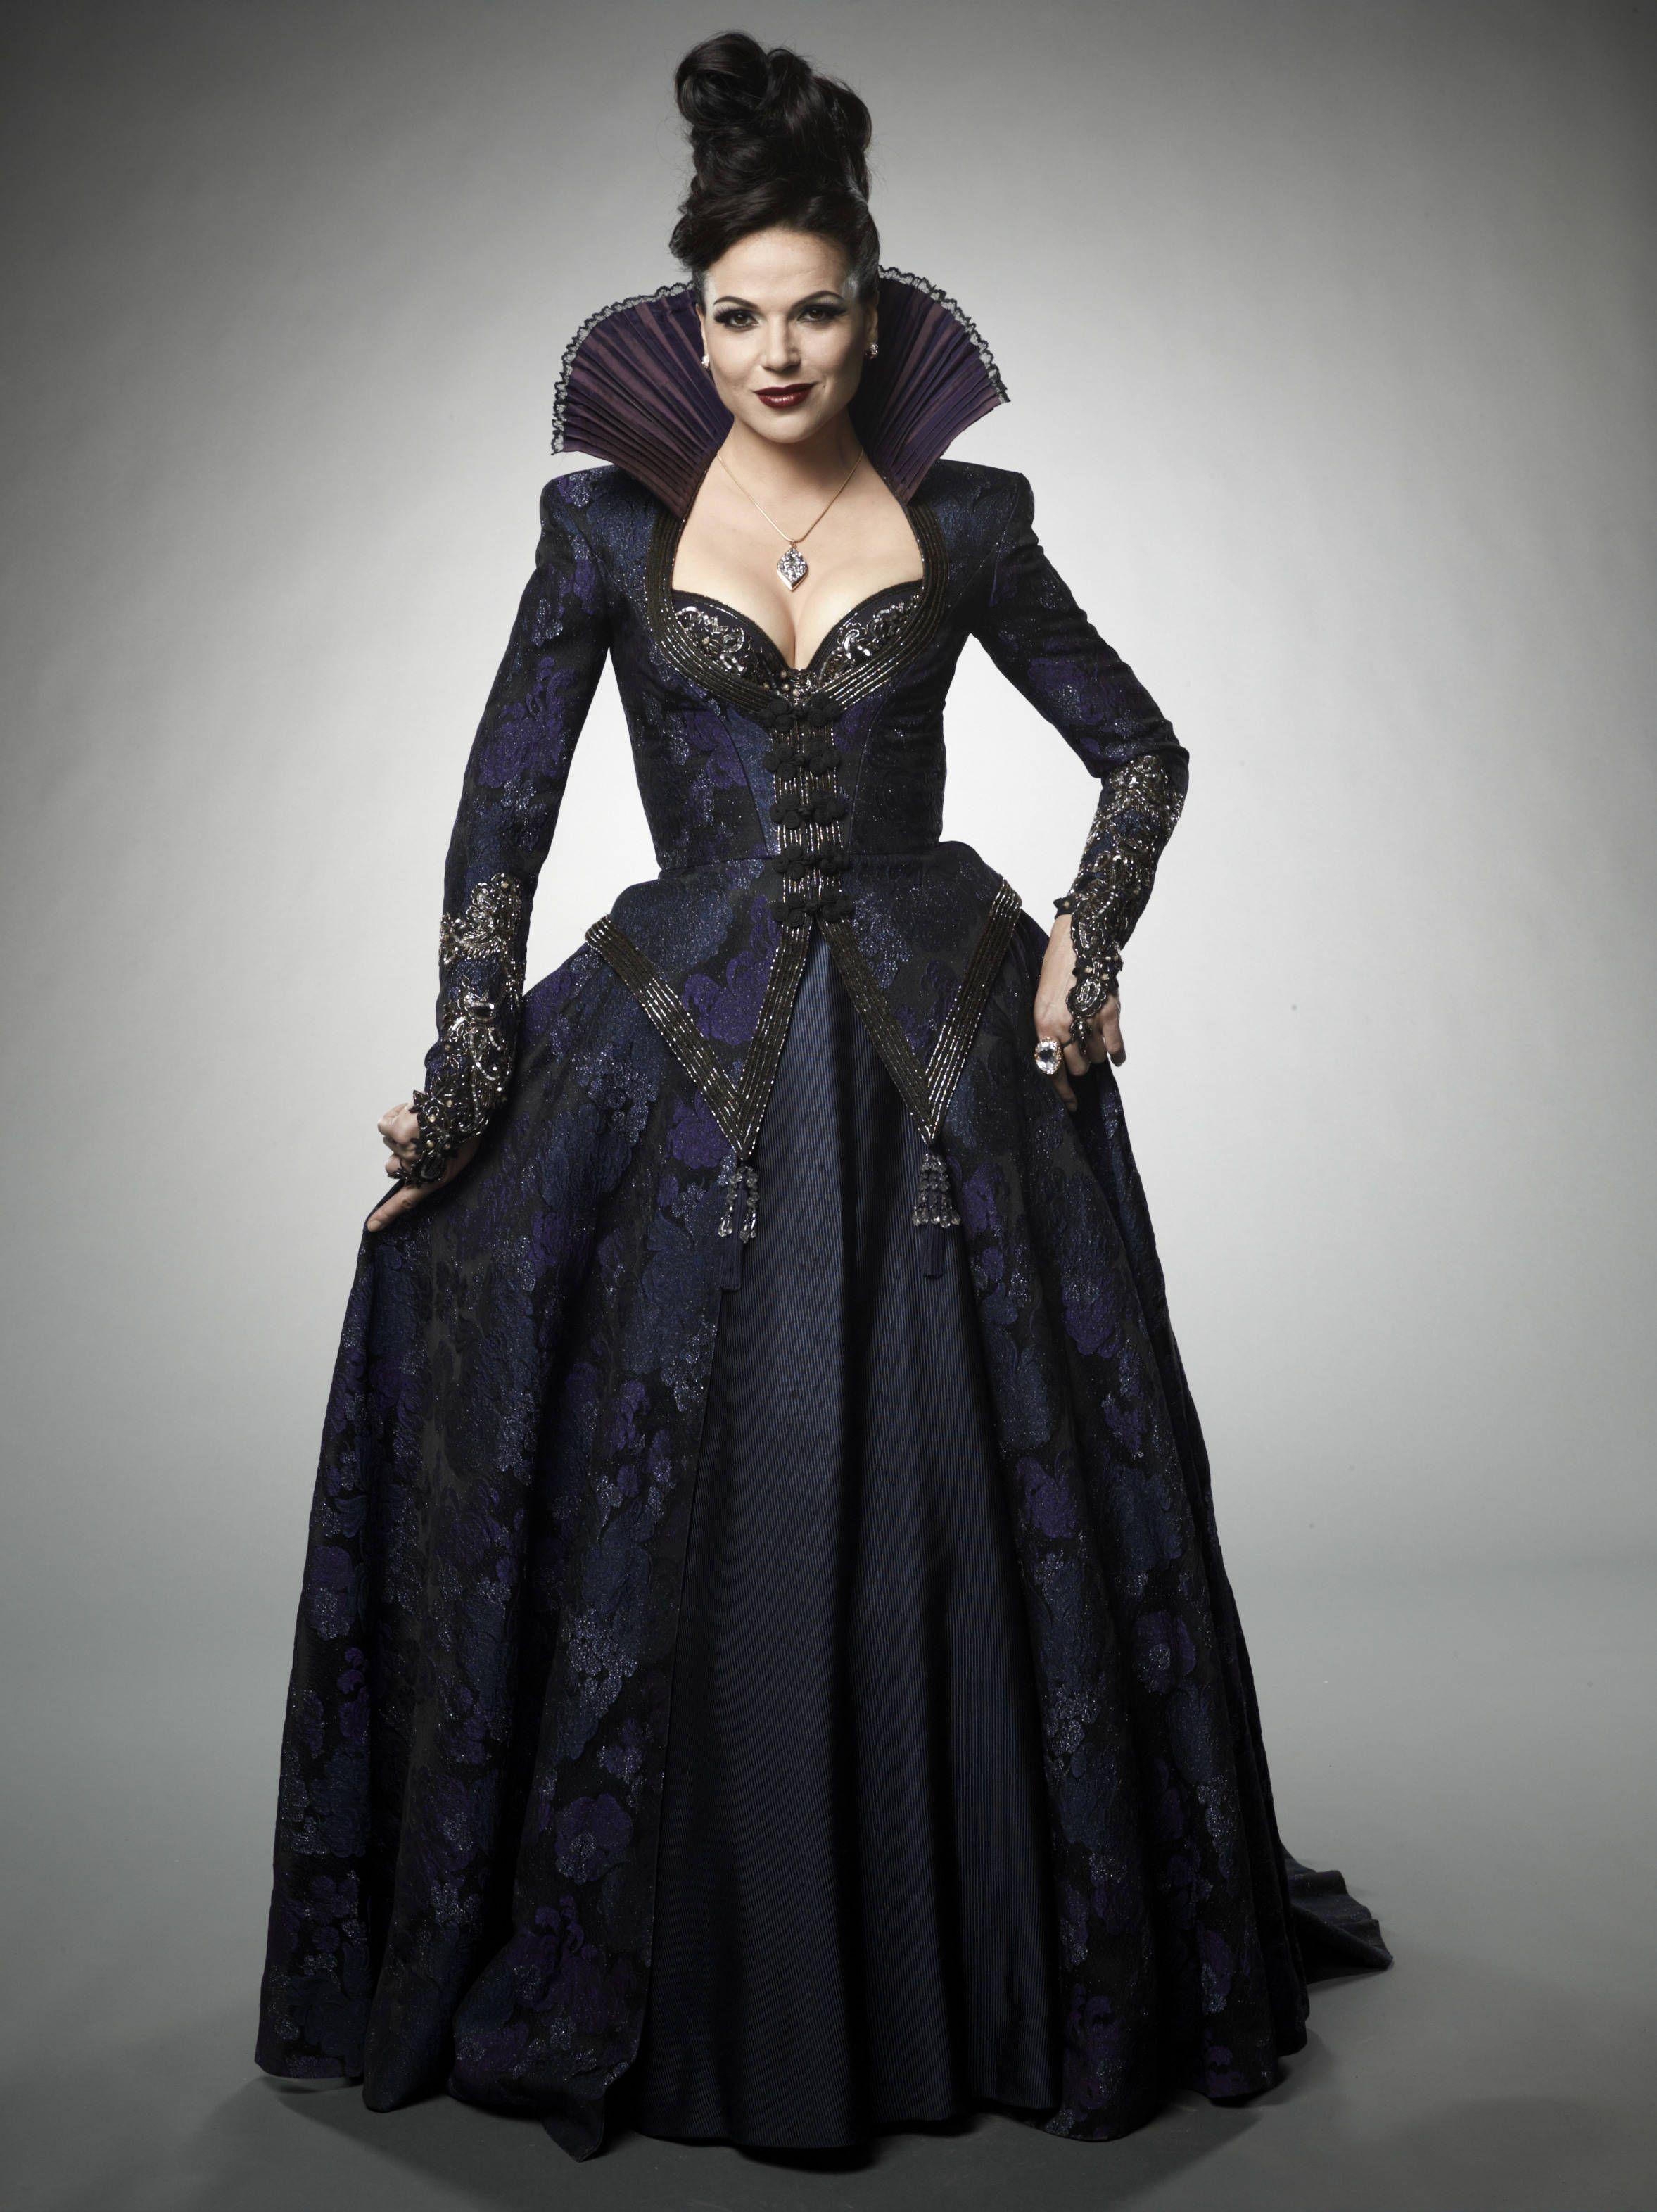 regina evil queen the evil queenregina mills regina